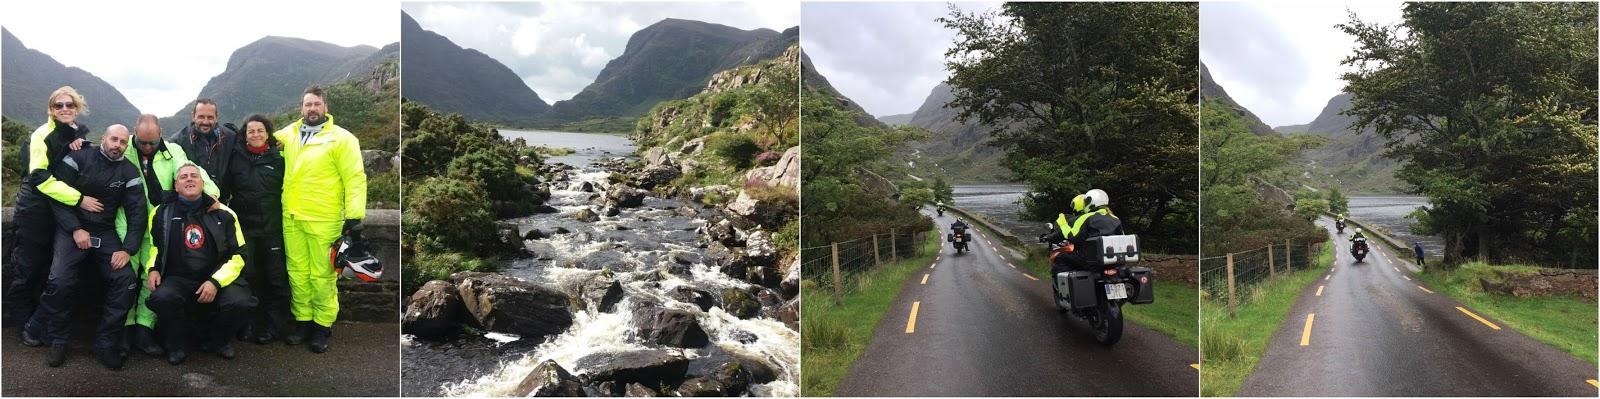 De Curvas  Transguinness 2017  De Viaje Por Irlanda